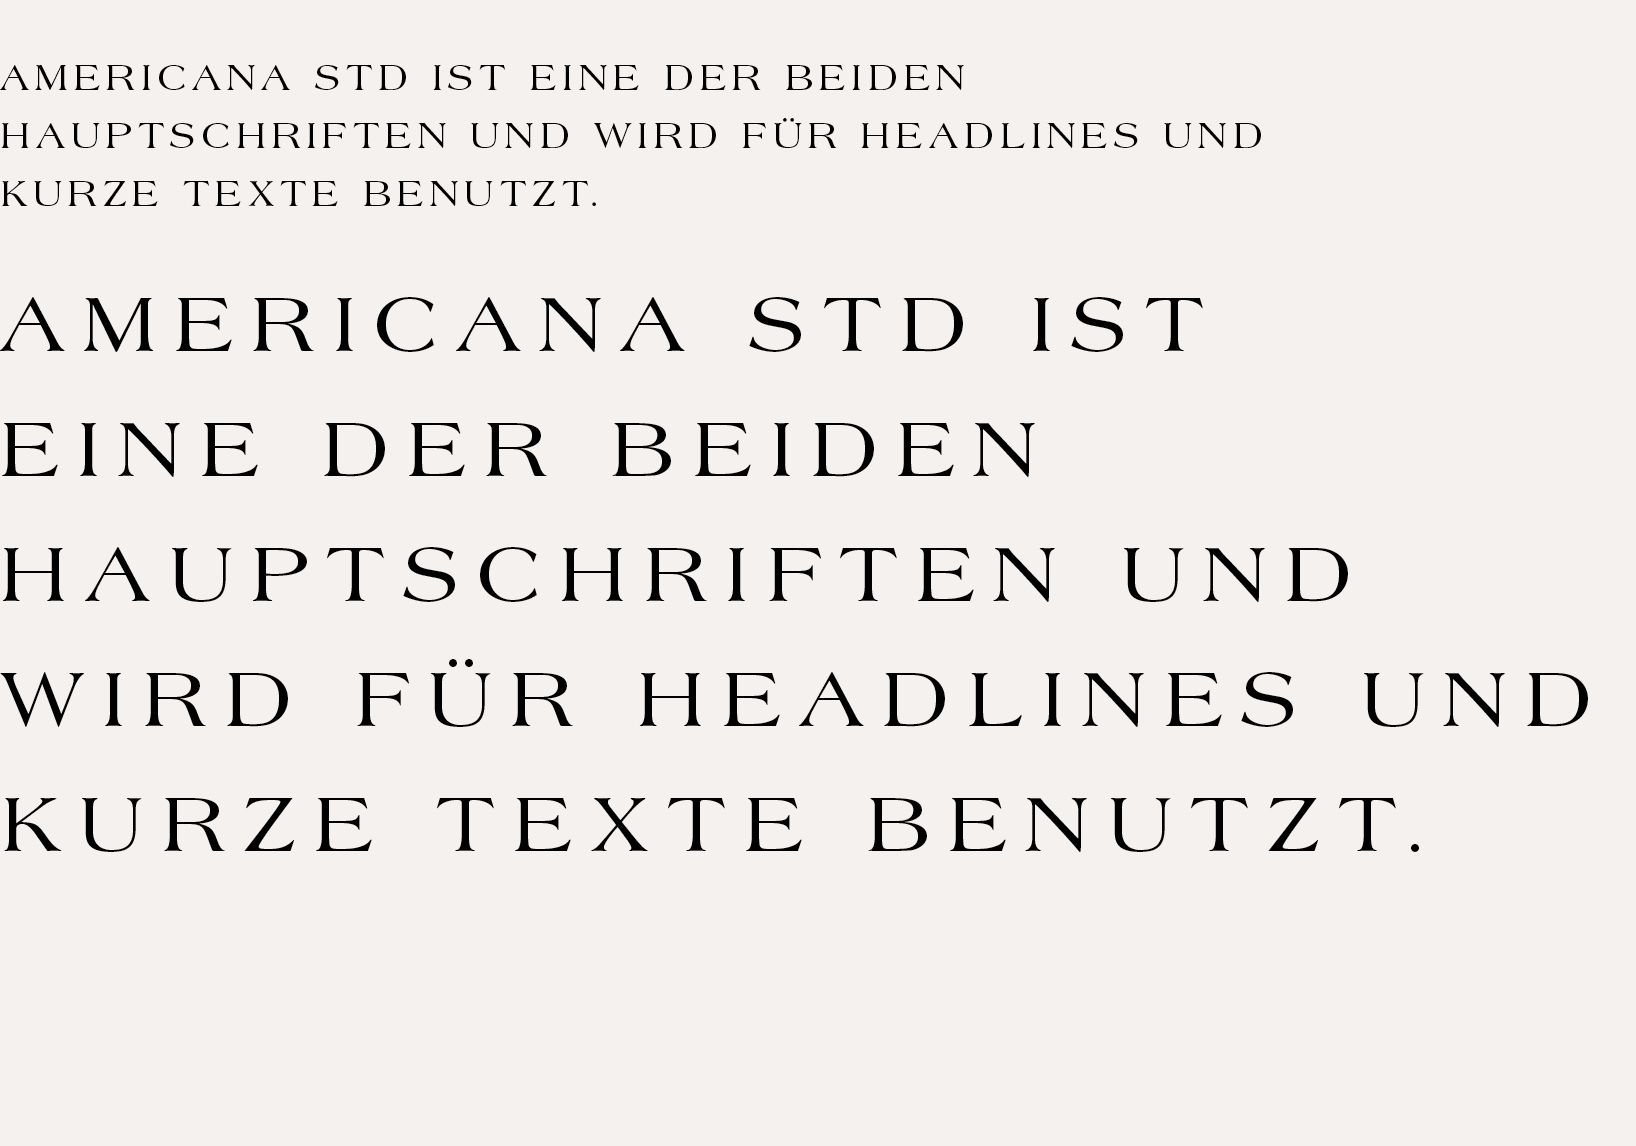 tg-meissen-ci-manual-americana-191112